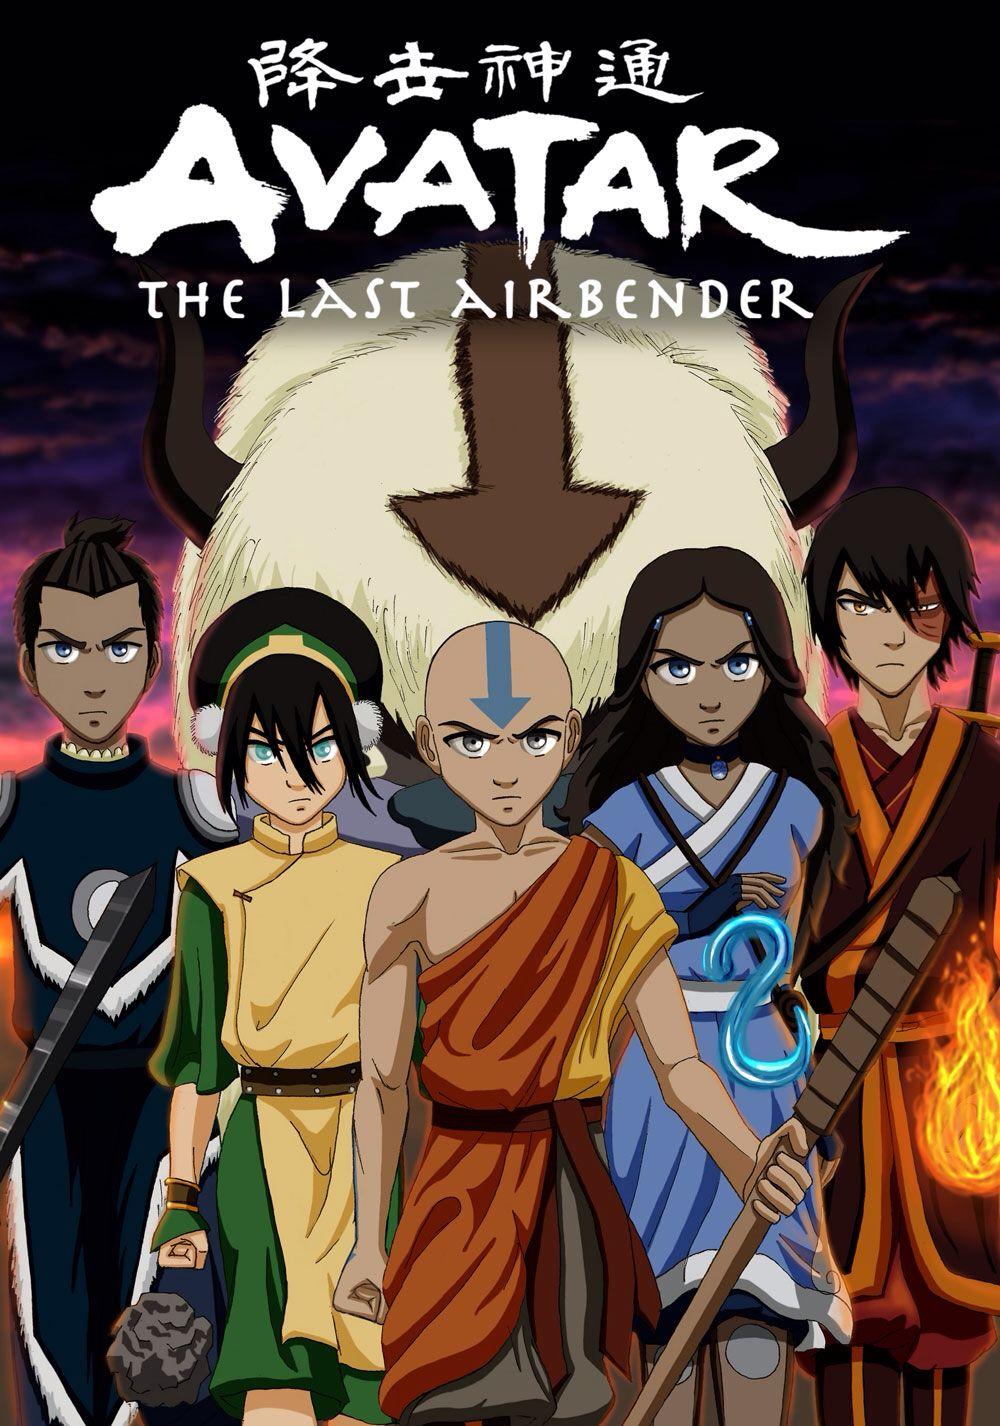 Sokka, Toph, Aang, Katara, and Zuko. Avatar airbender